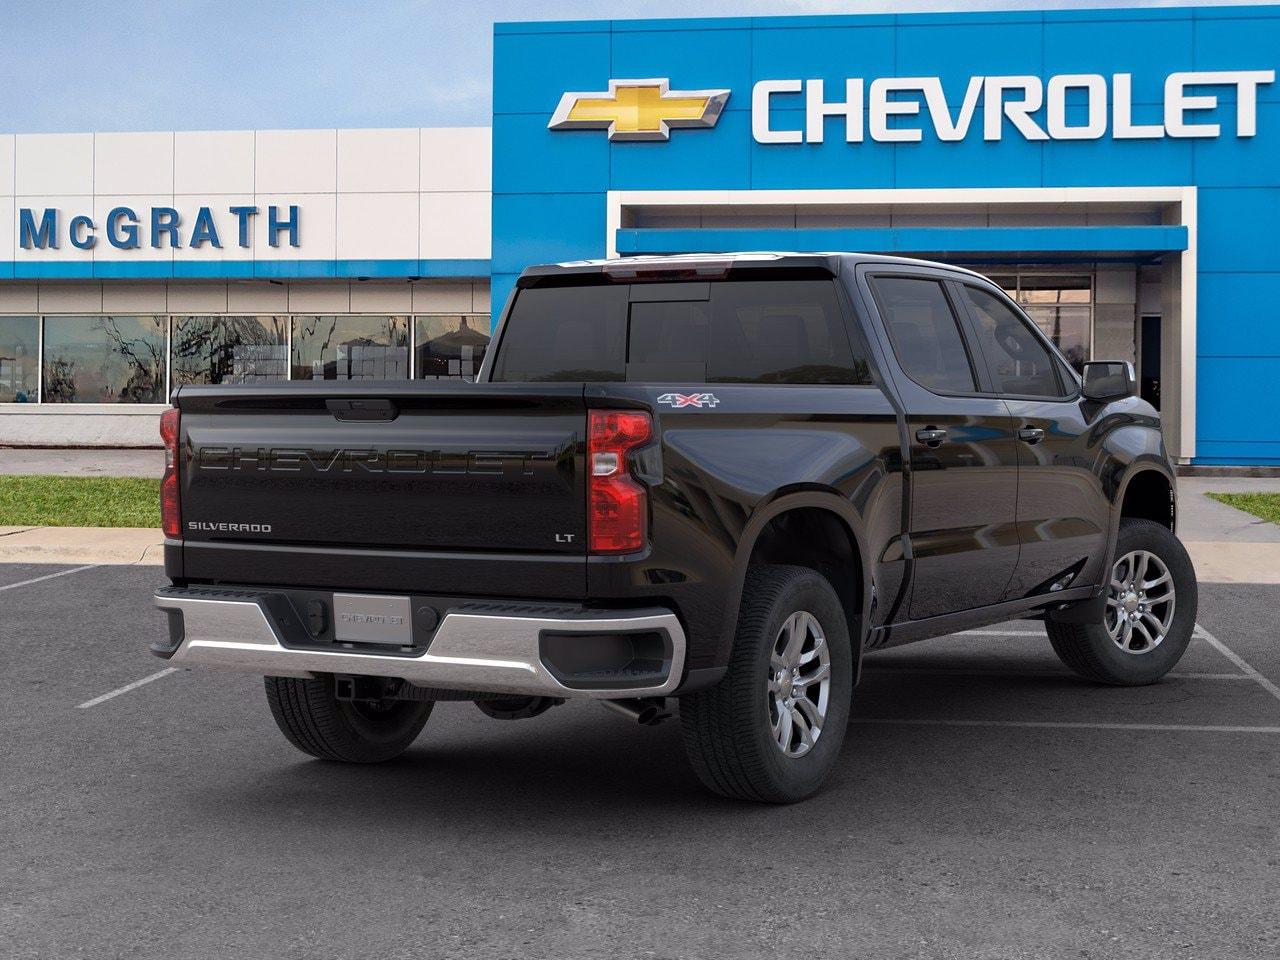 2020 Chevrolet Silverado 1500 Crew Cab 4x4, Pickup #C201449 - photo 2